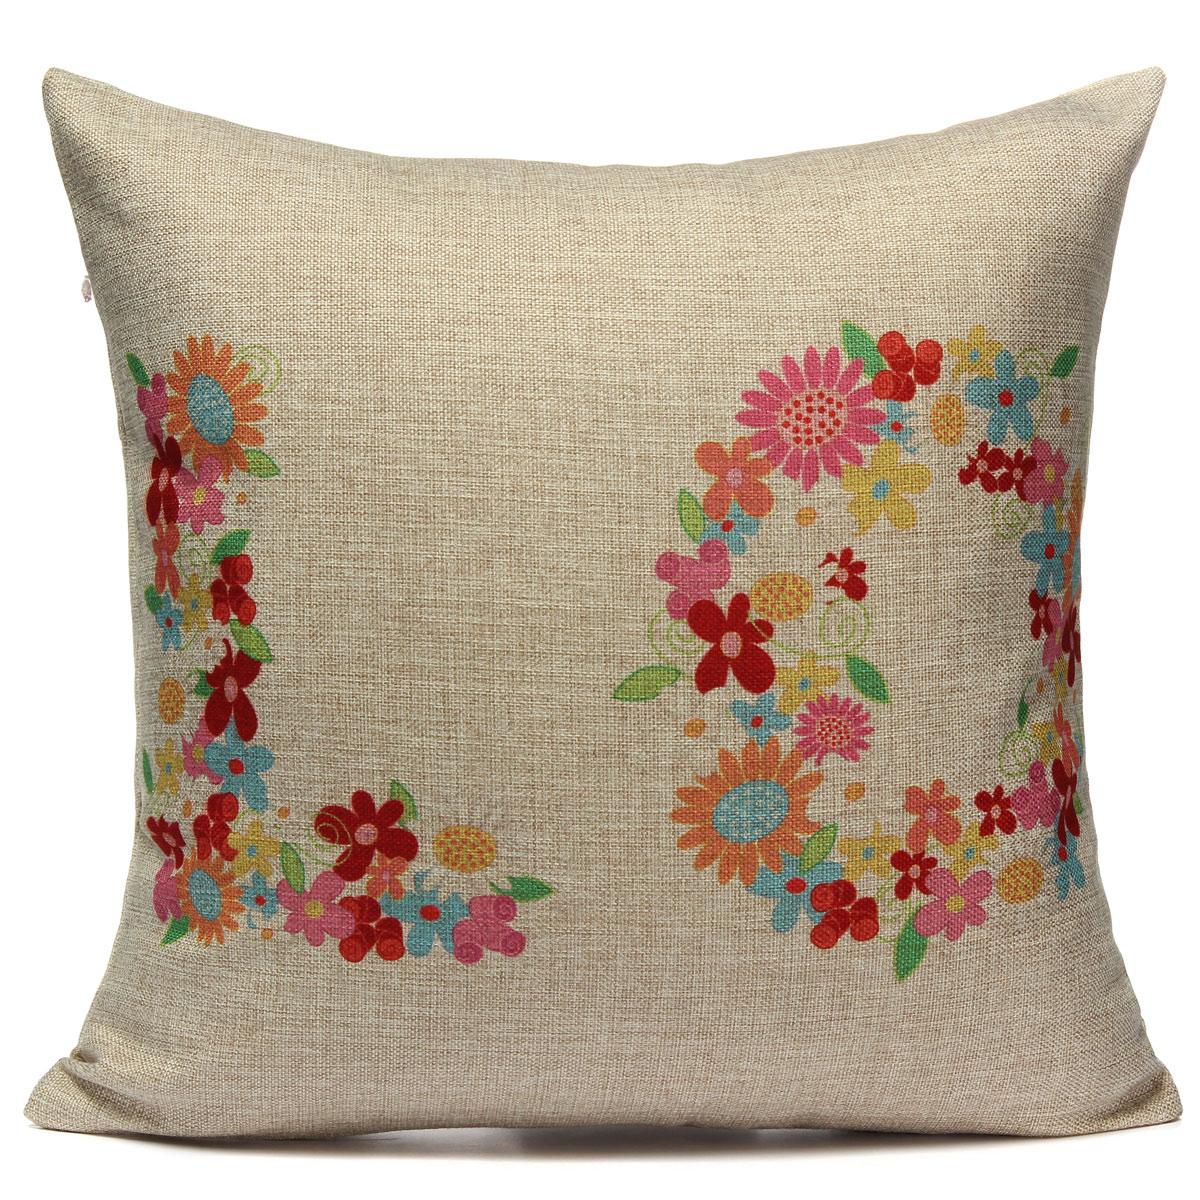 Cotton Linen LOVE Throw Pillow Case Car Cushion Cover Home Decor Valentine s Day